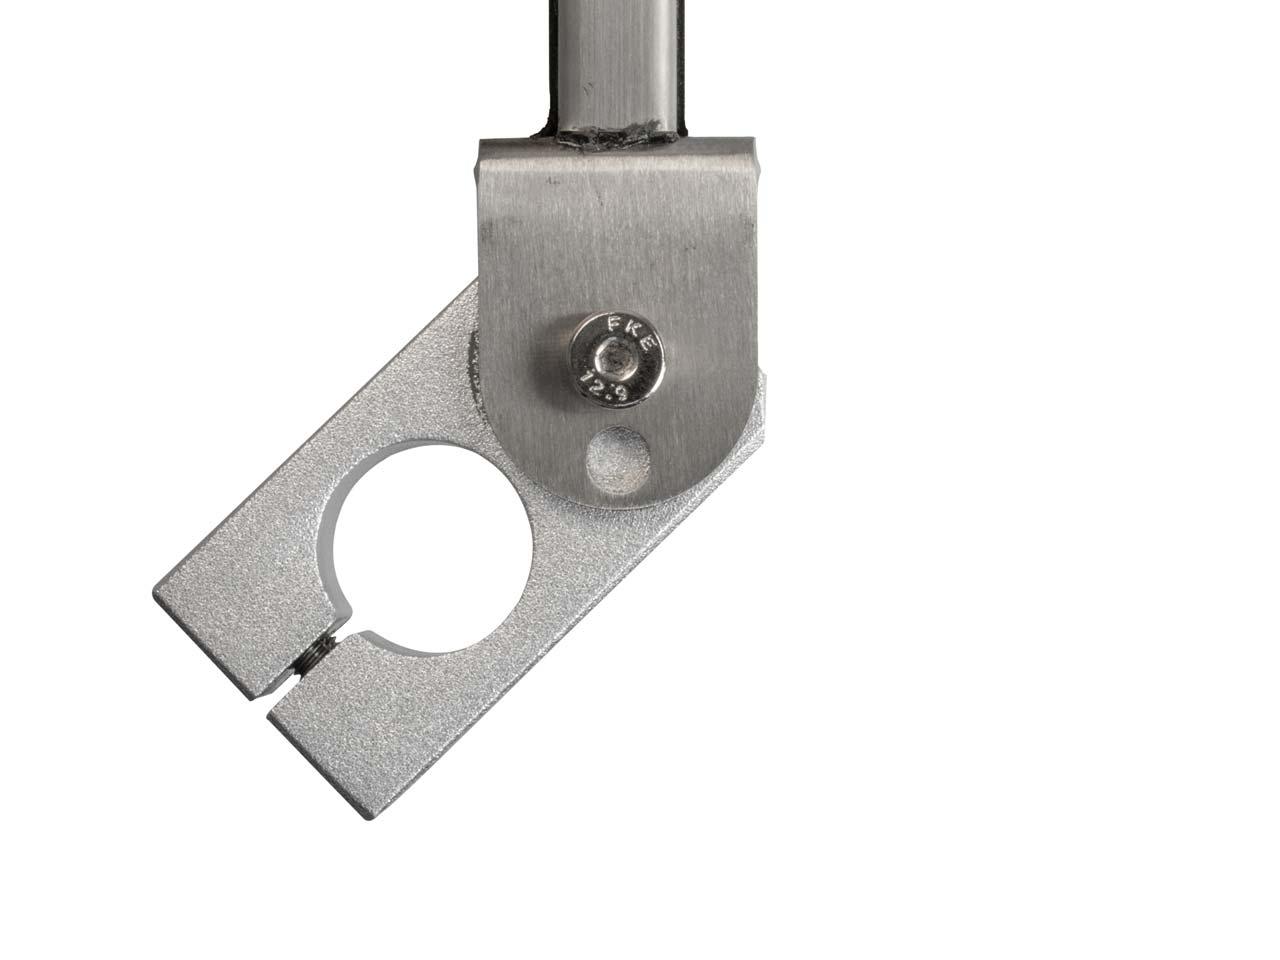 Genuine-US-Foredom-Workbench-Accessories-System miniatura 53